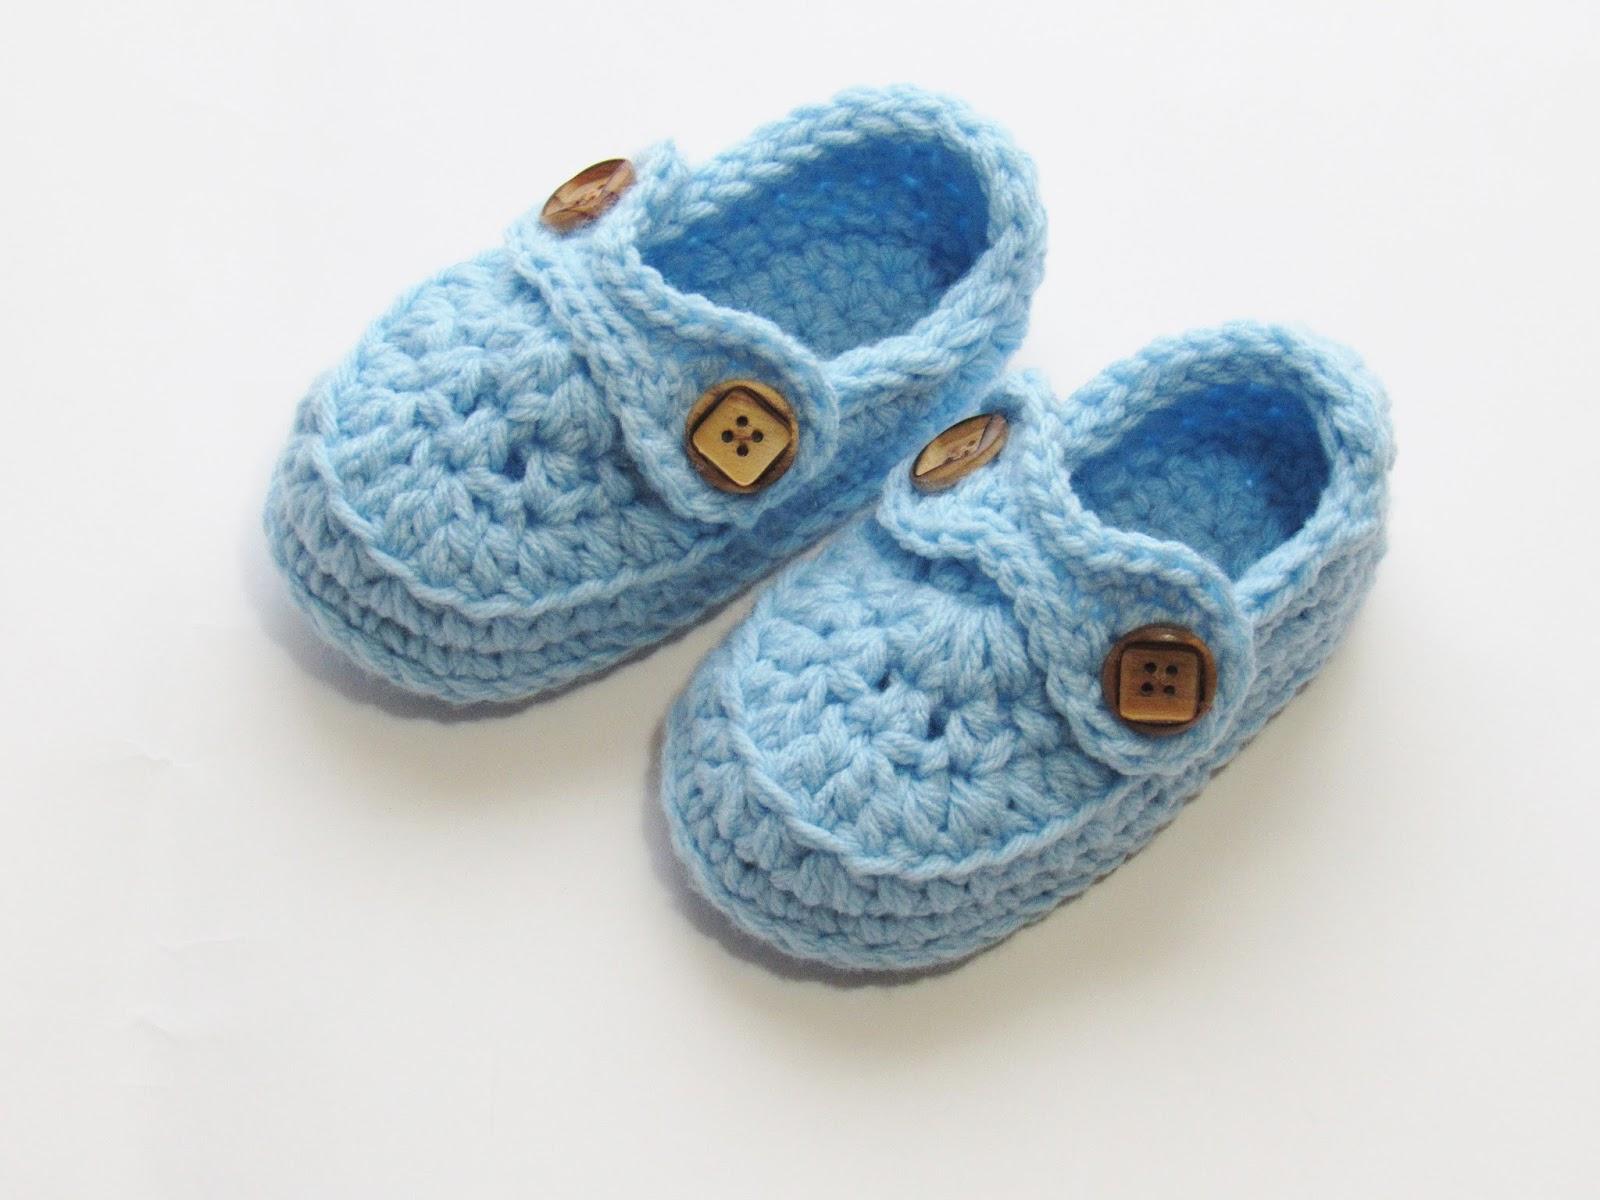 Crochet Patterns For Toddler Boy : Crochet Dreamz: Toddler Striders, Toddler Slippers Crochet ...